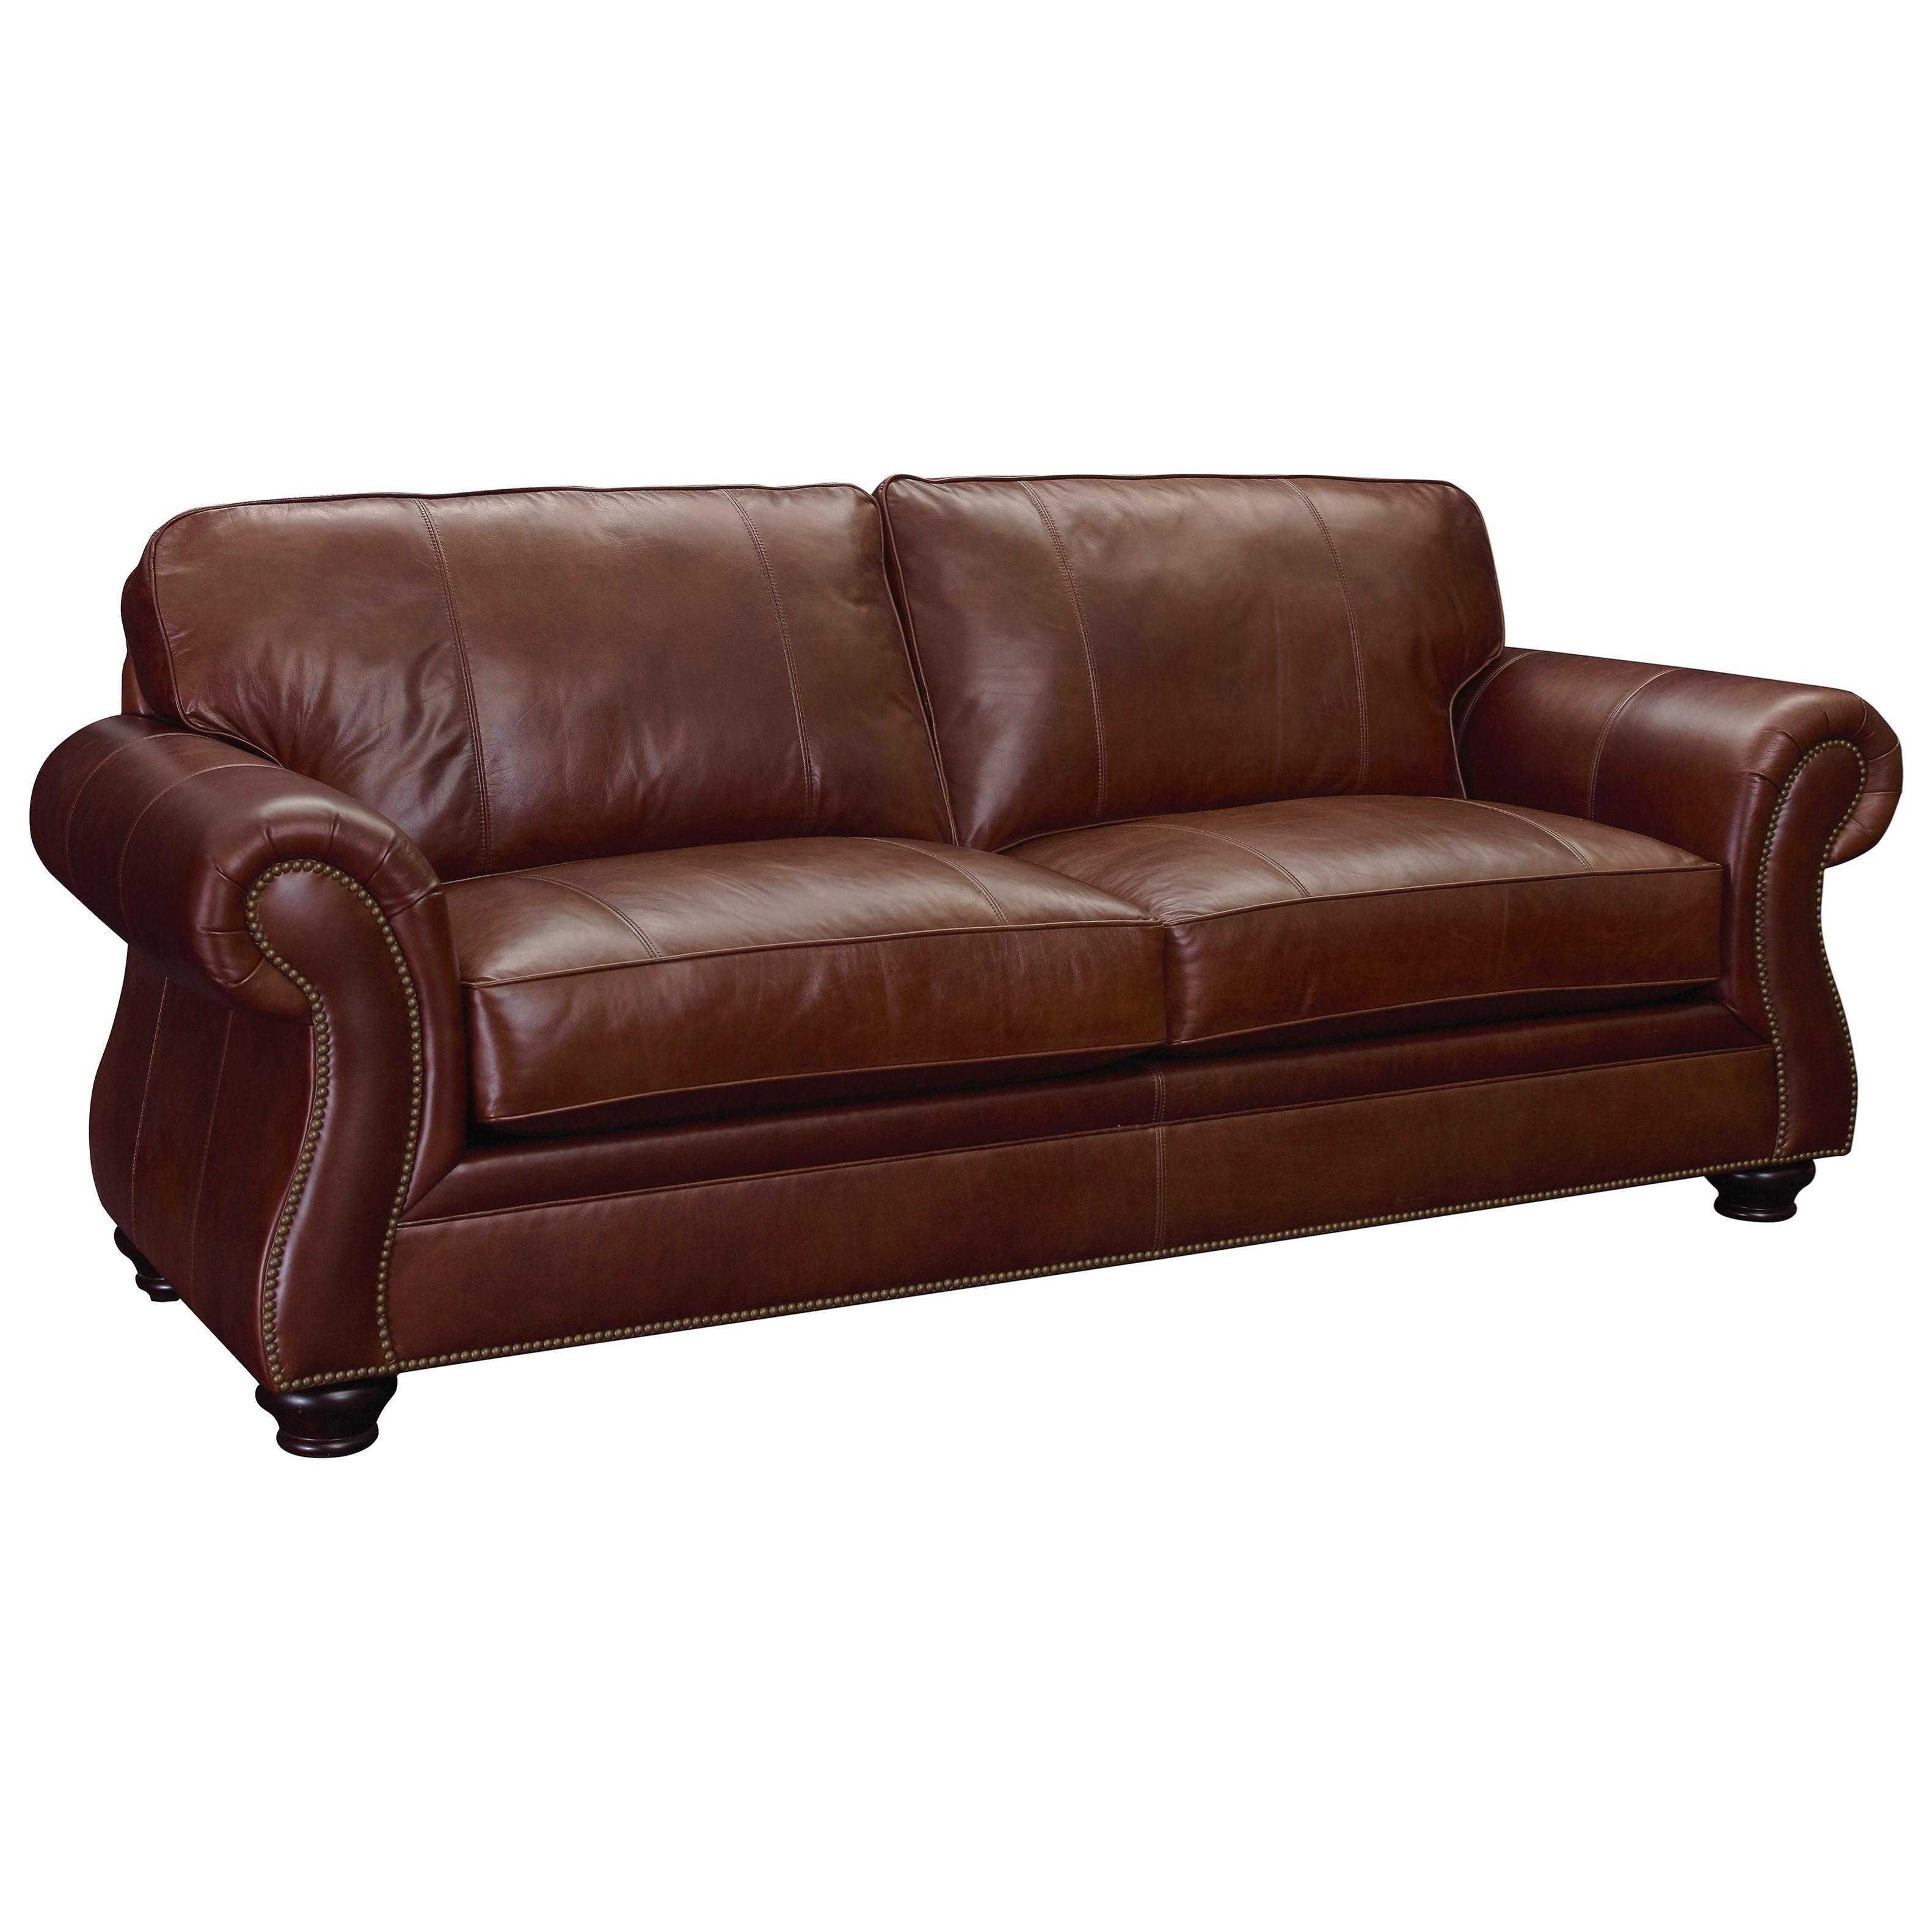 Broyhill Furniture Laramie Air Dream Sofa Sleeper With